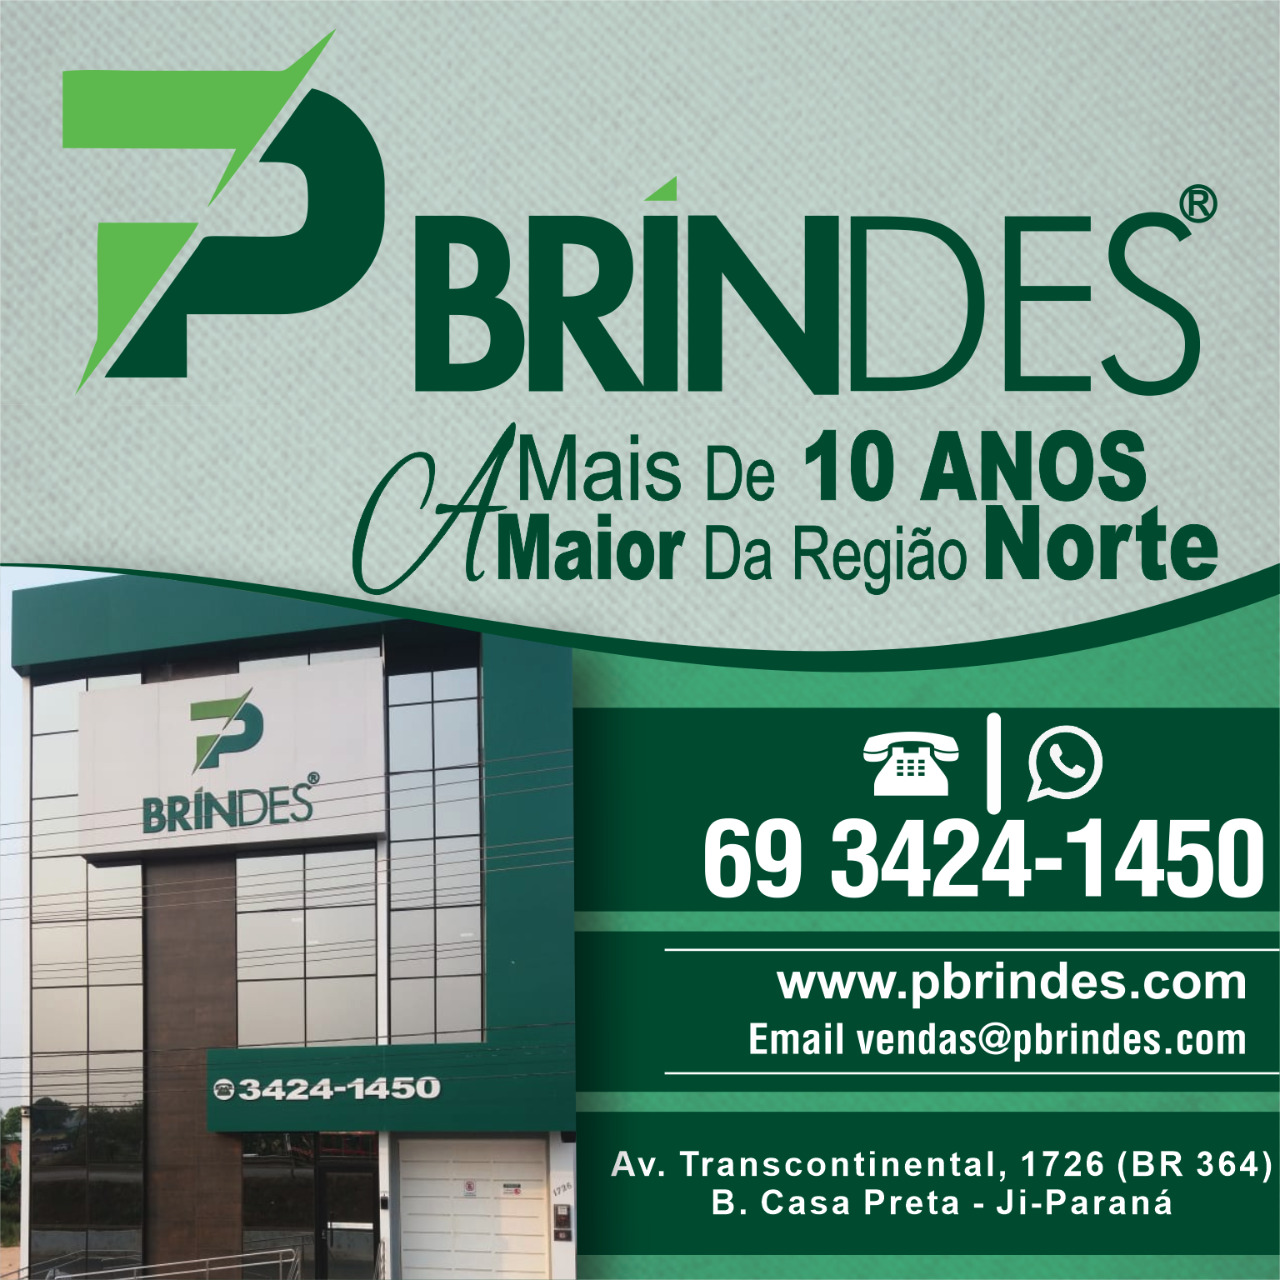 pbrindes